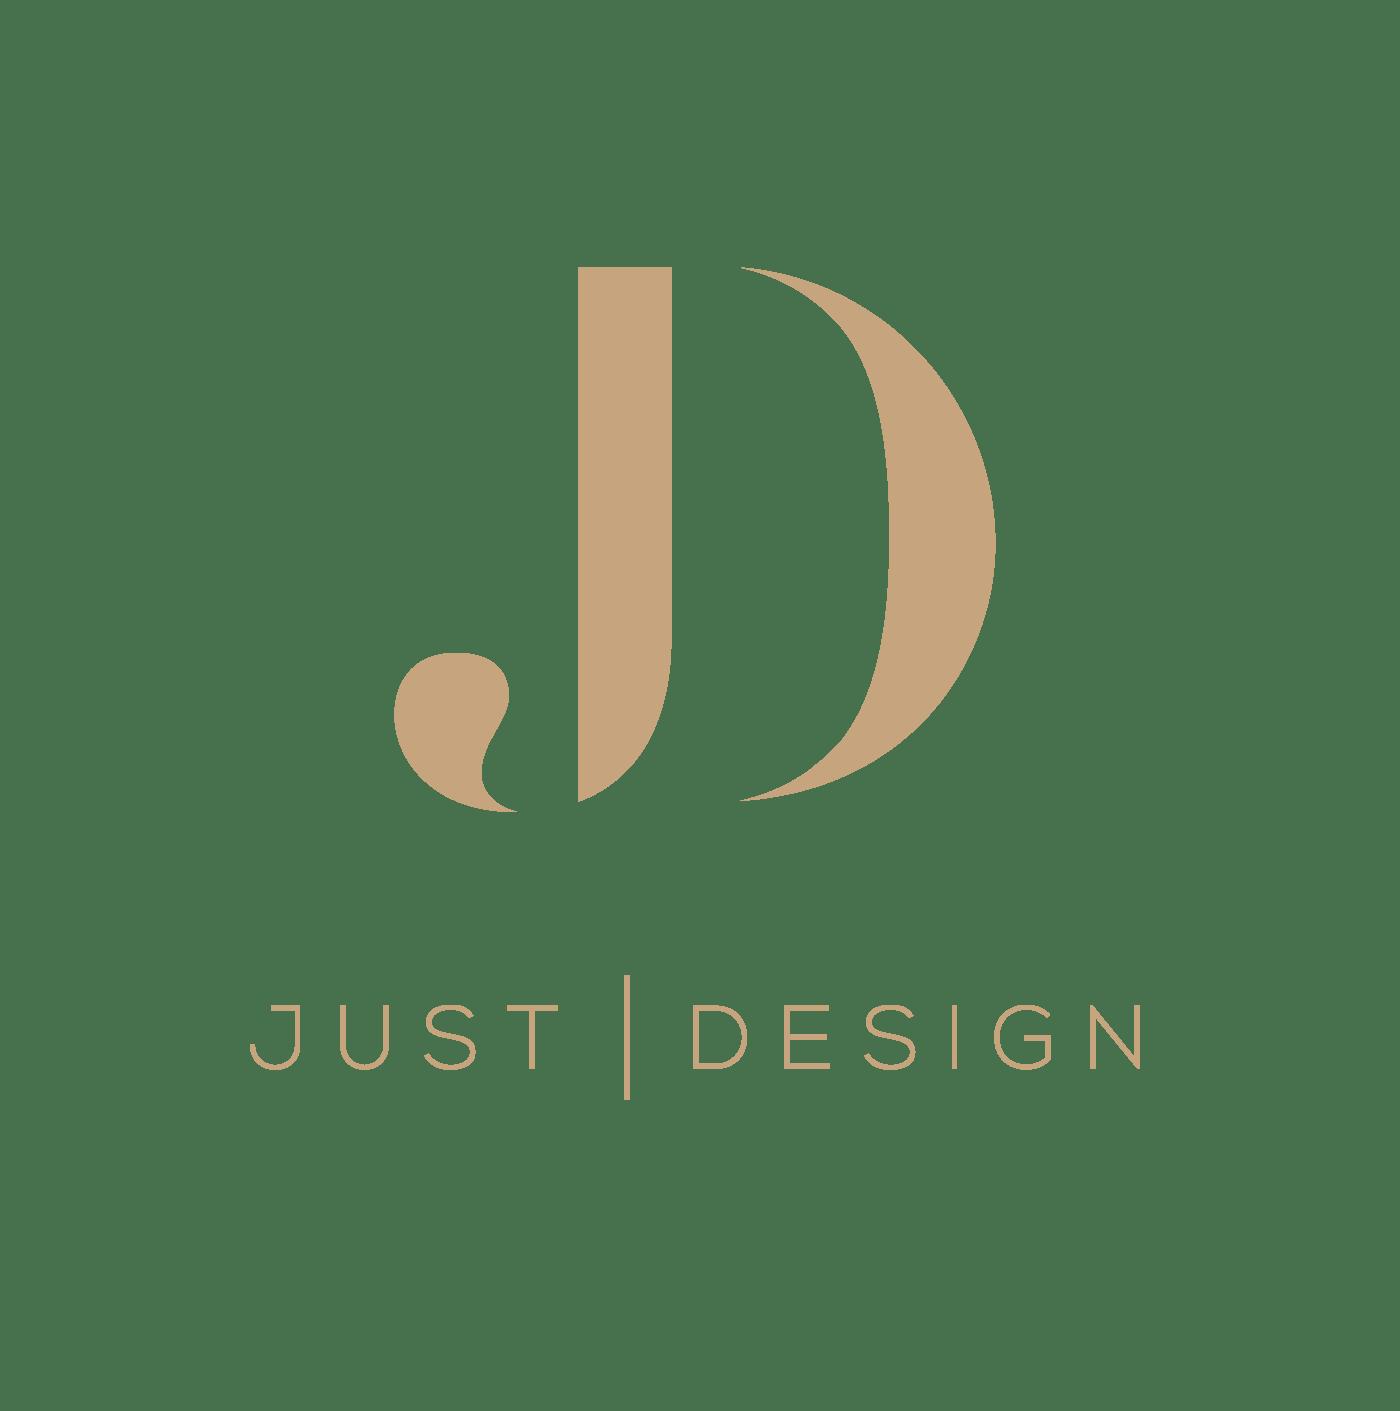 snorren justdesign logo accent